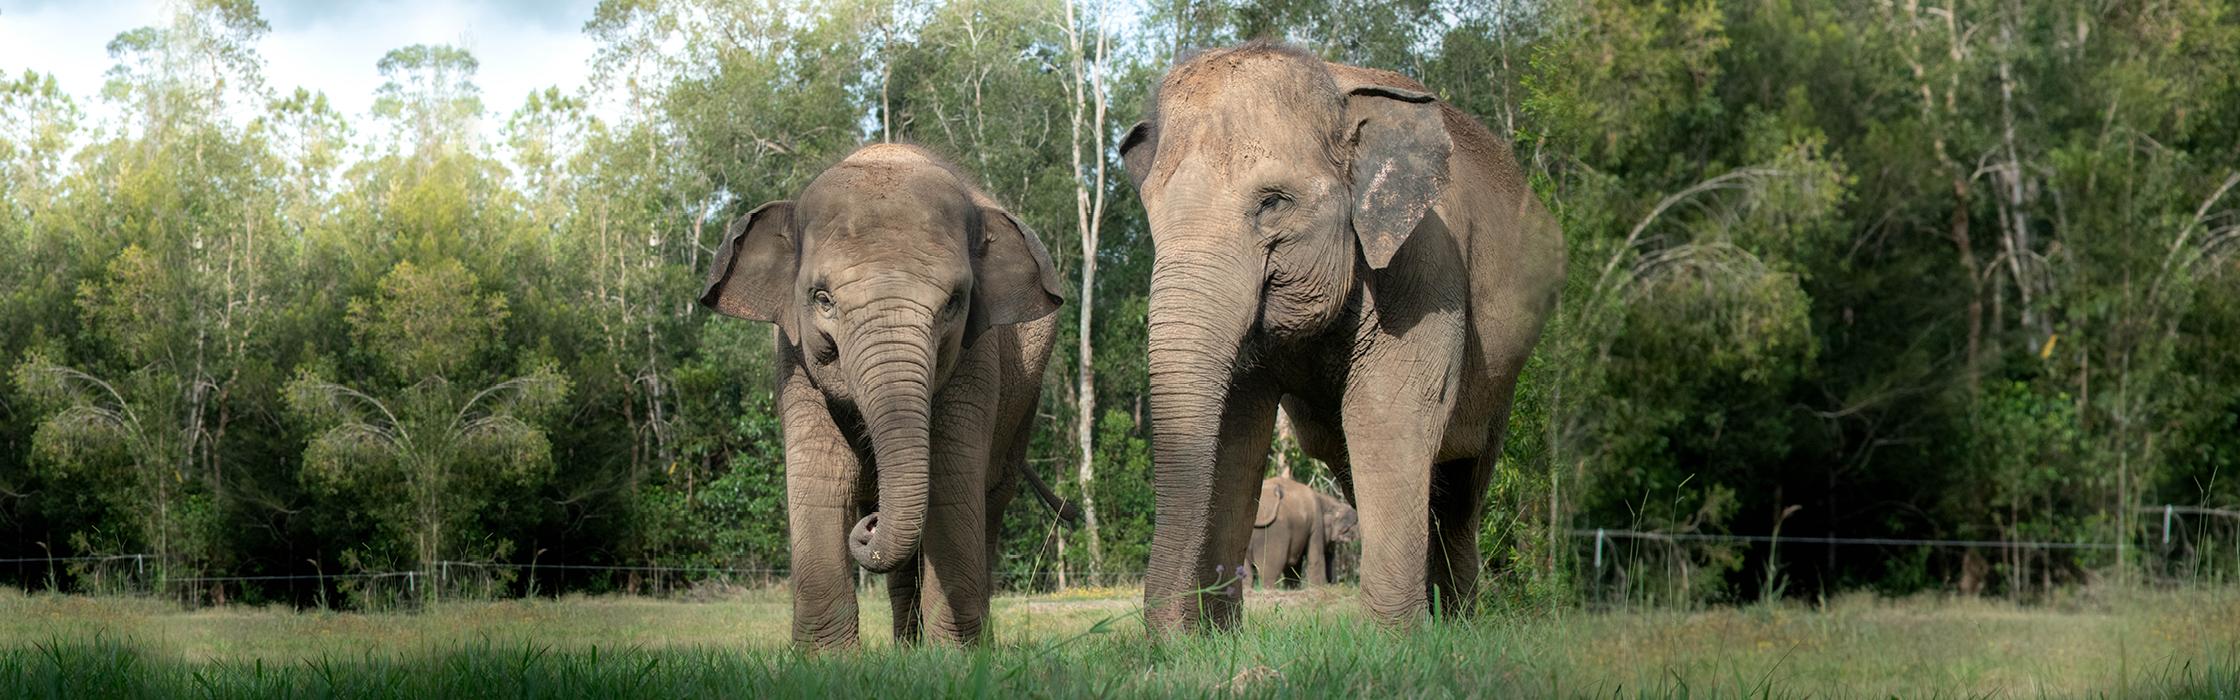 5833_WEBSITE_BANNER_ELEPHANTS2